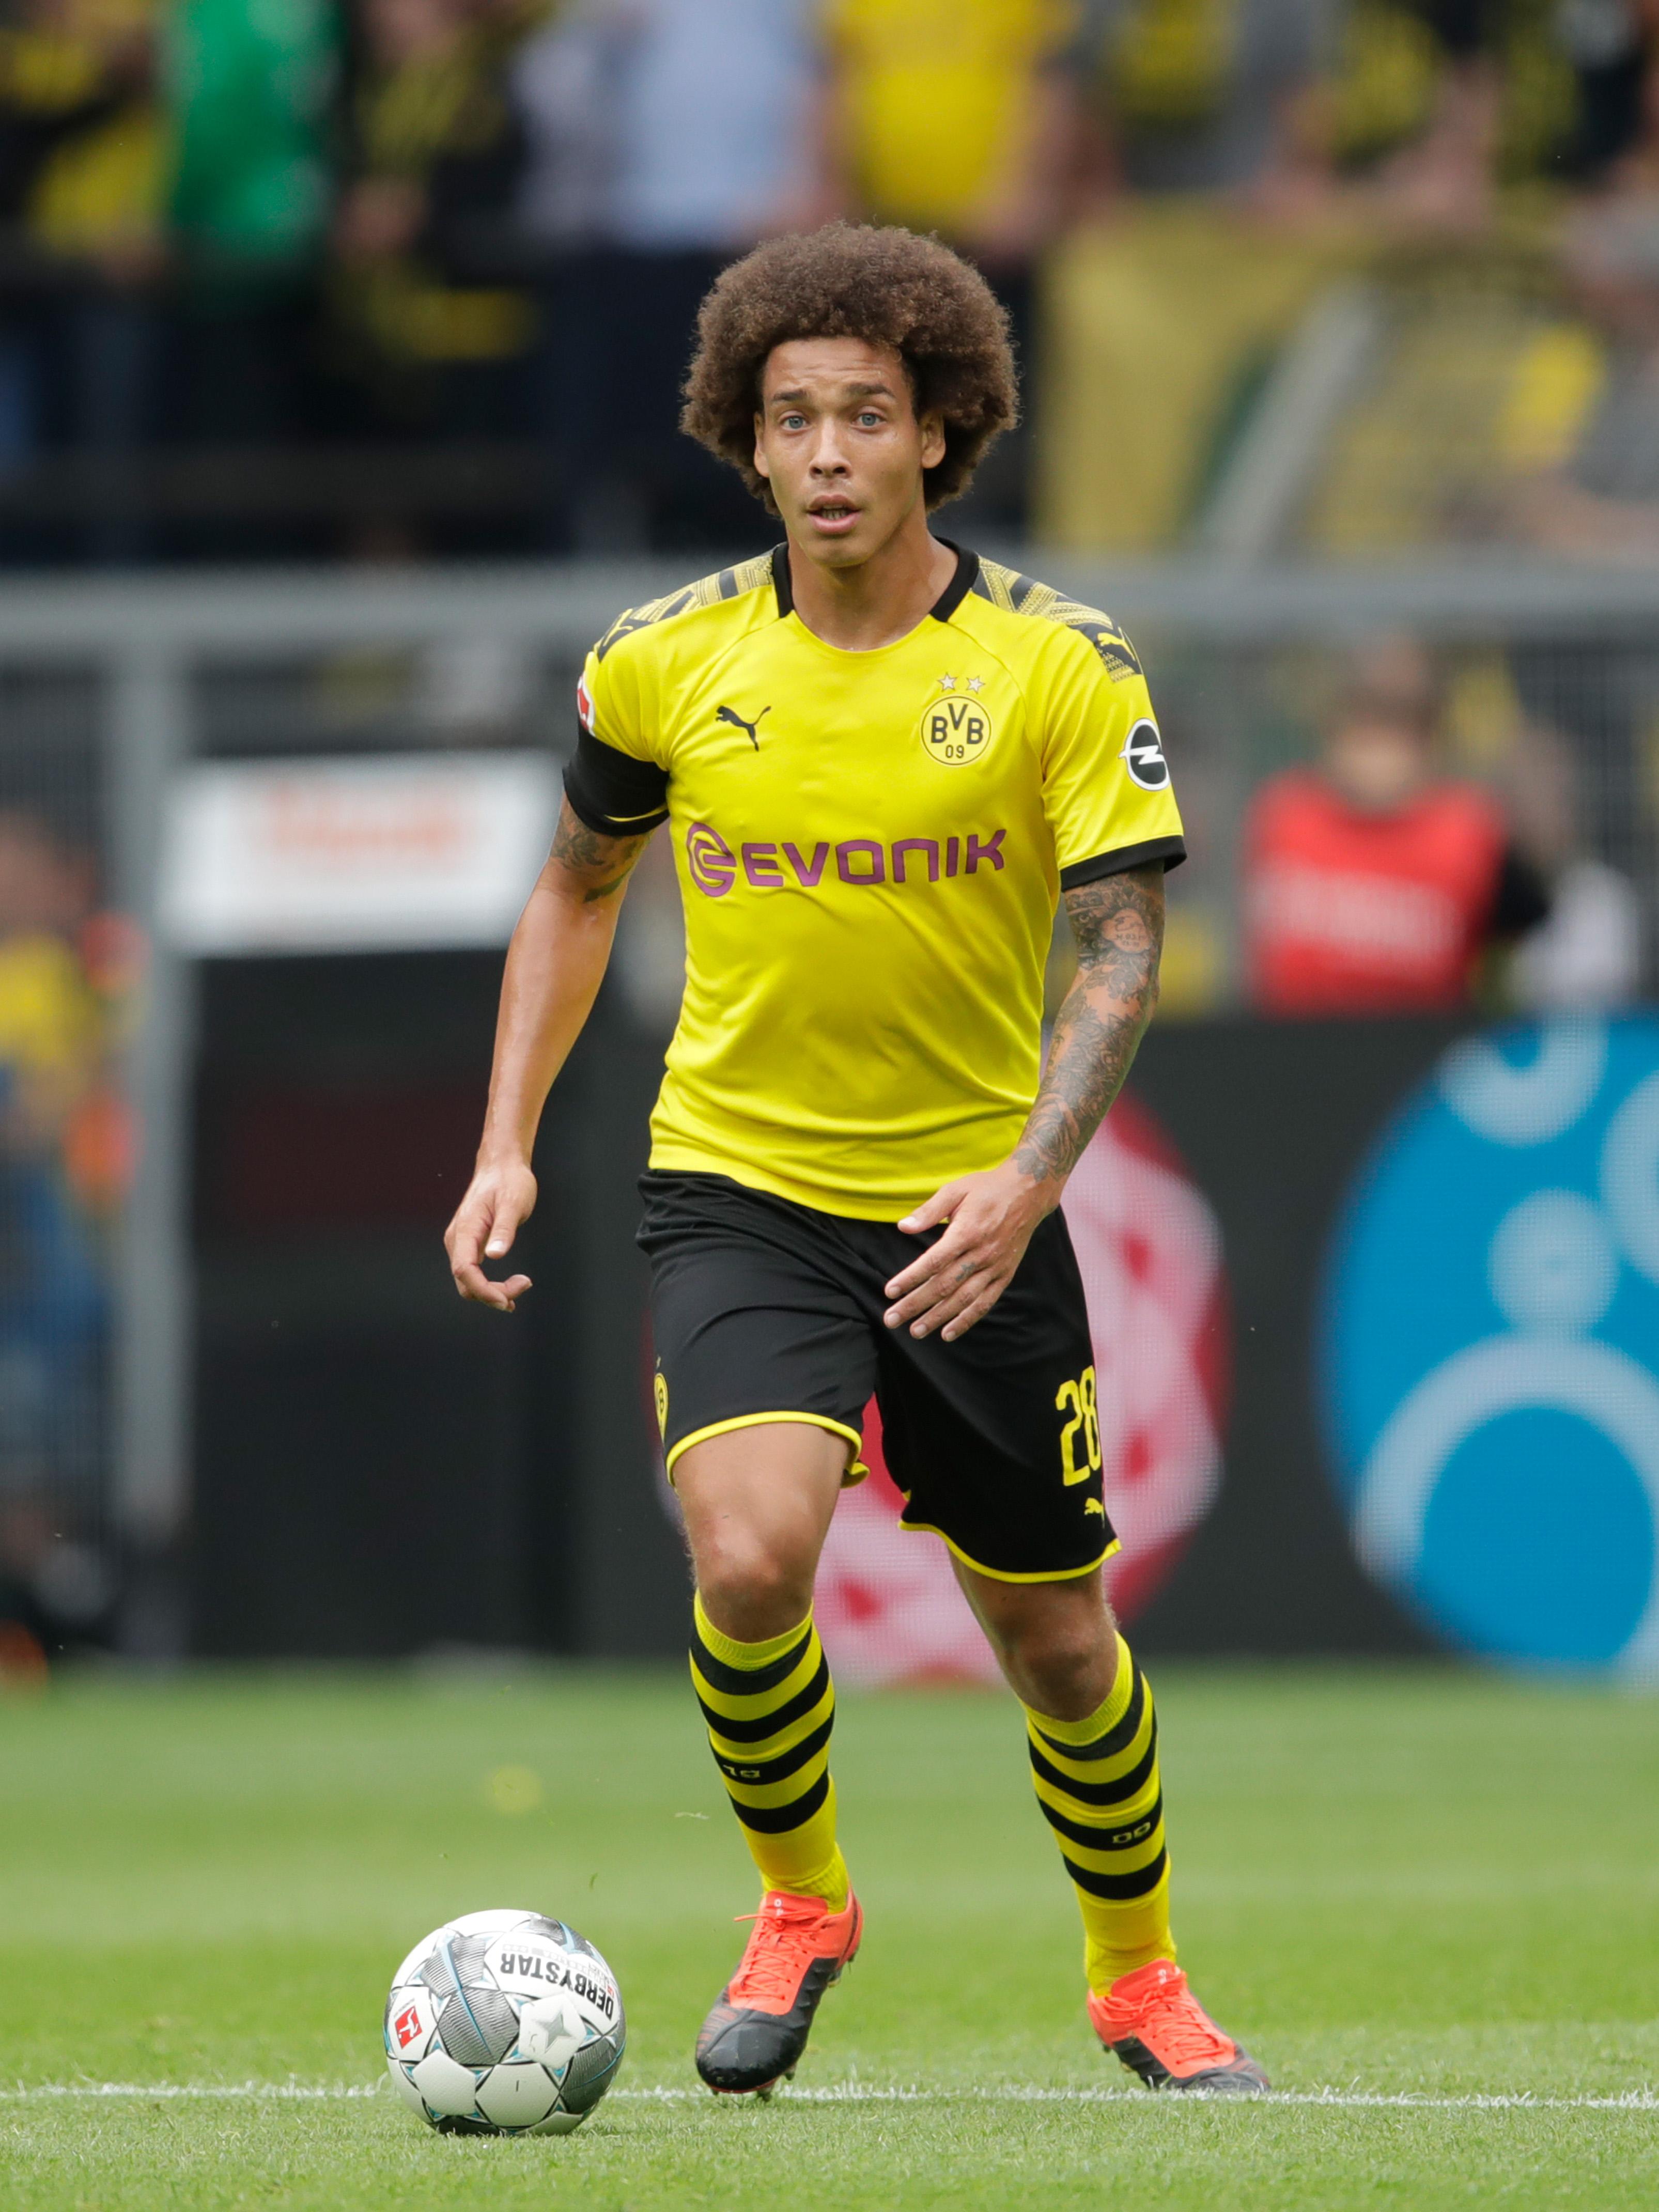 Borussia Dortmund v FC Augsburg - German Bundesliga